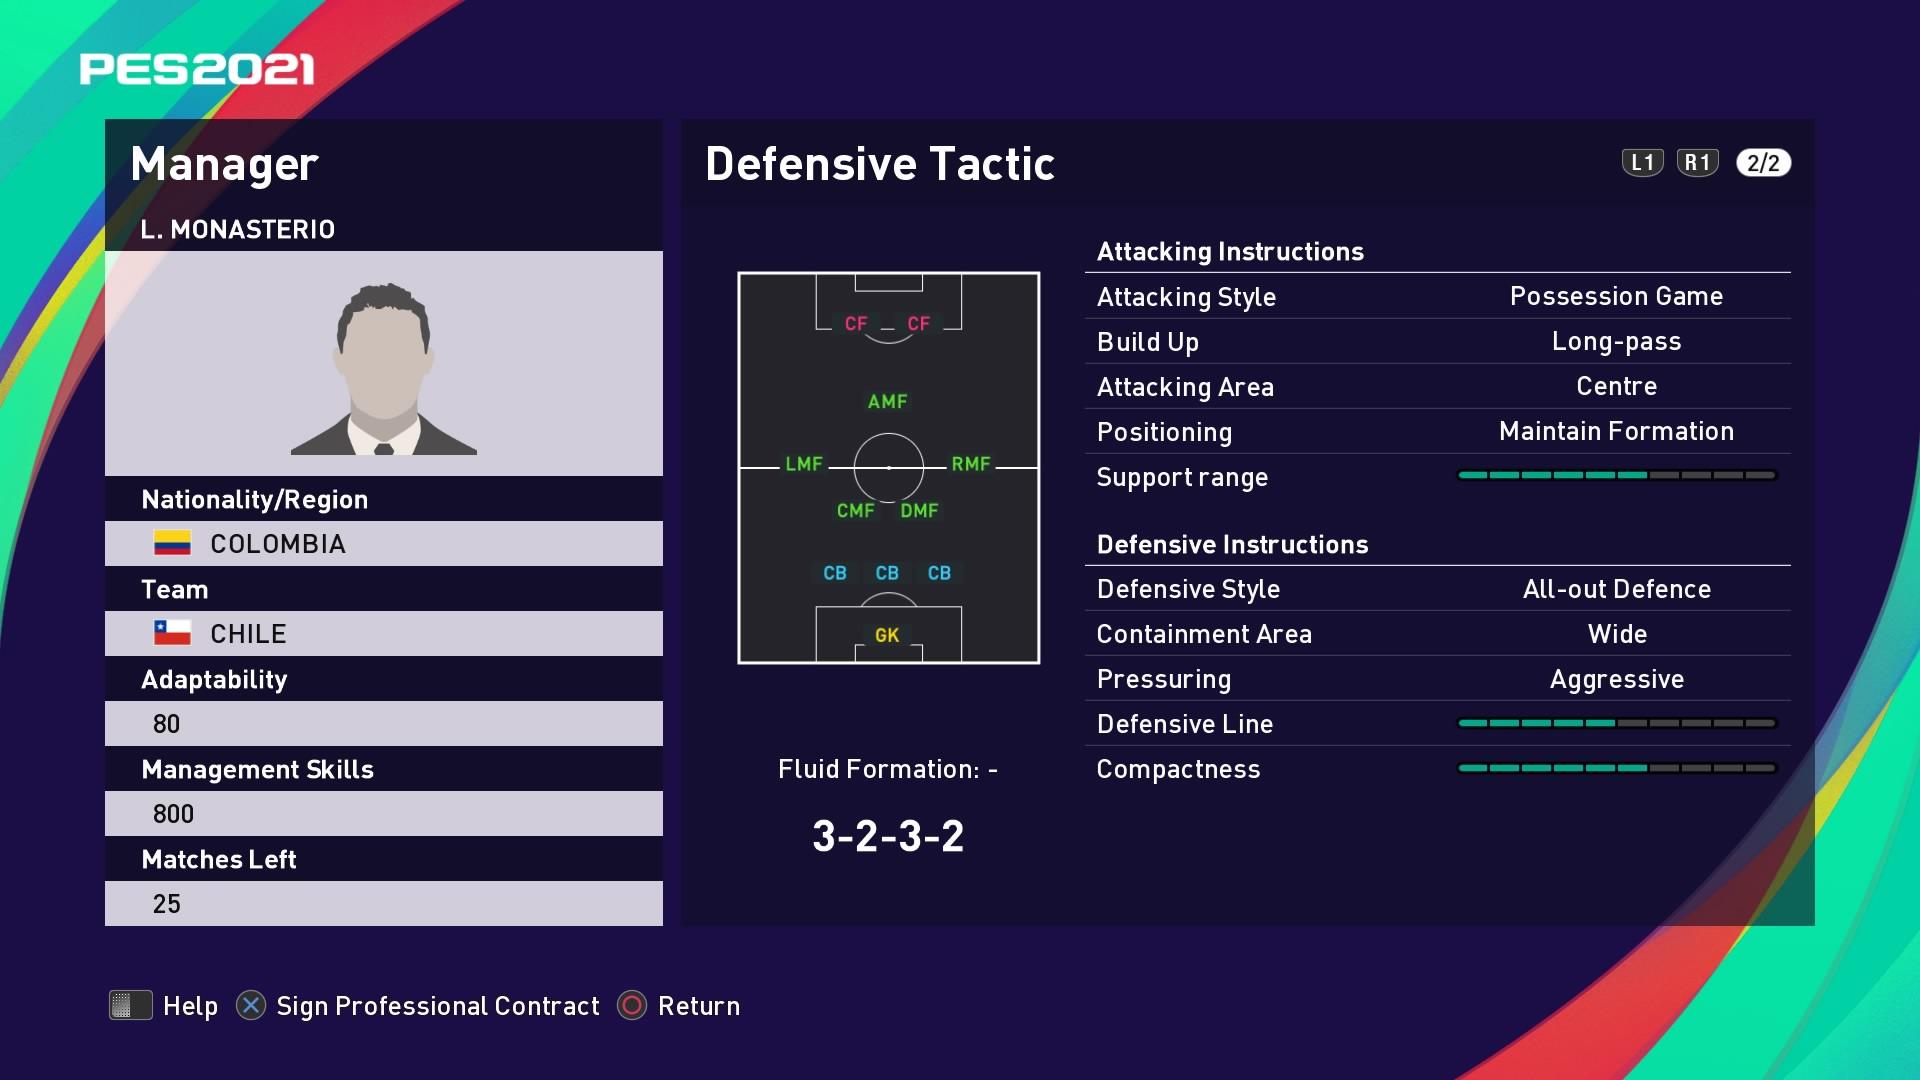 L. Monasterio (Reinaldo Rueda) Defensive Tactic in PES 2021 myClub